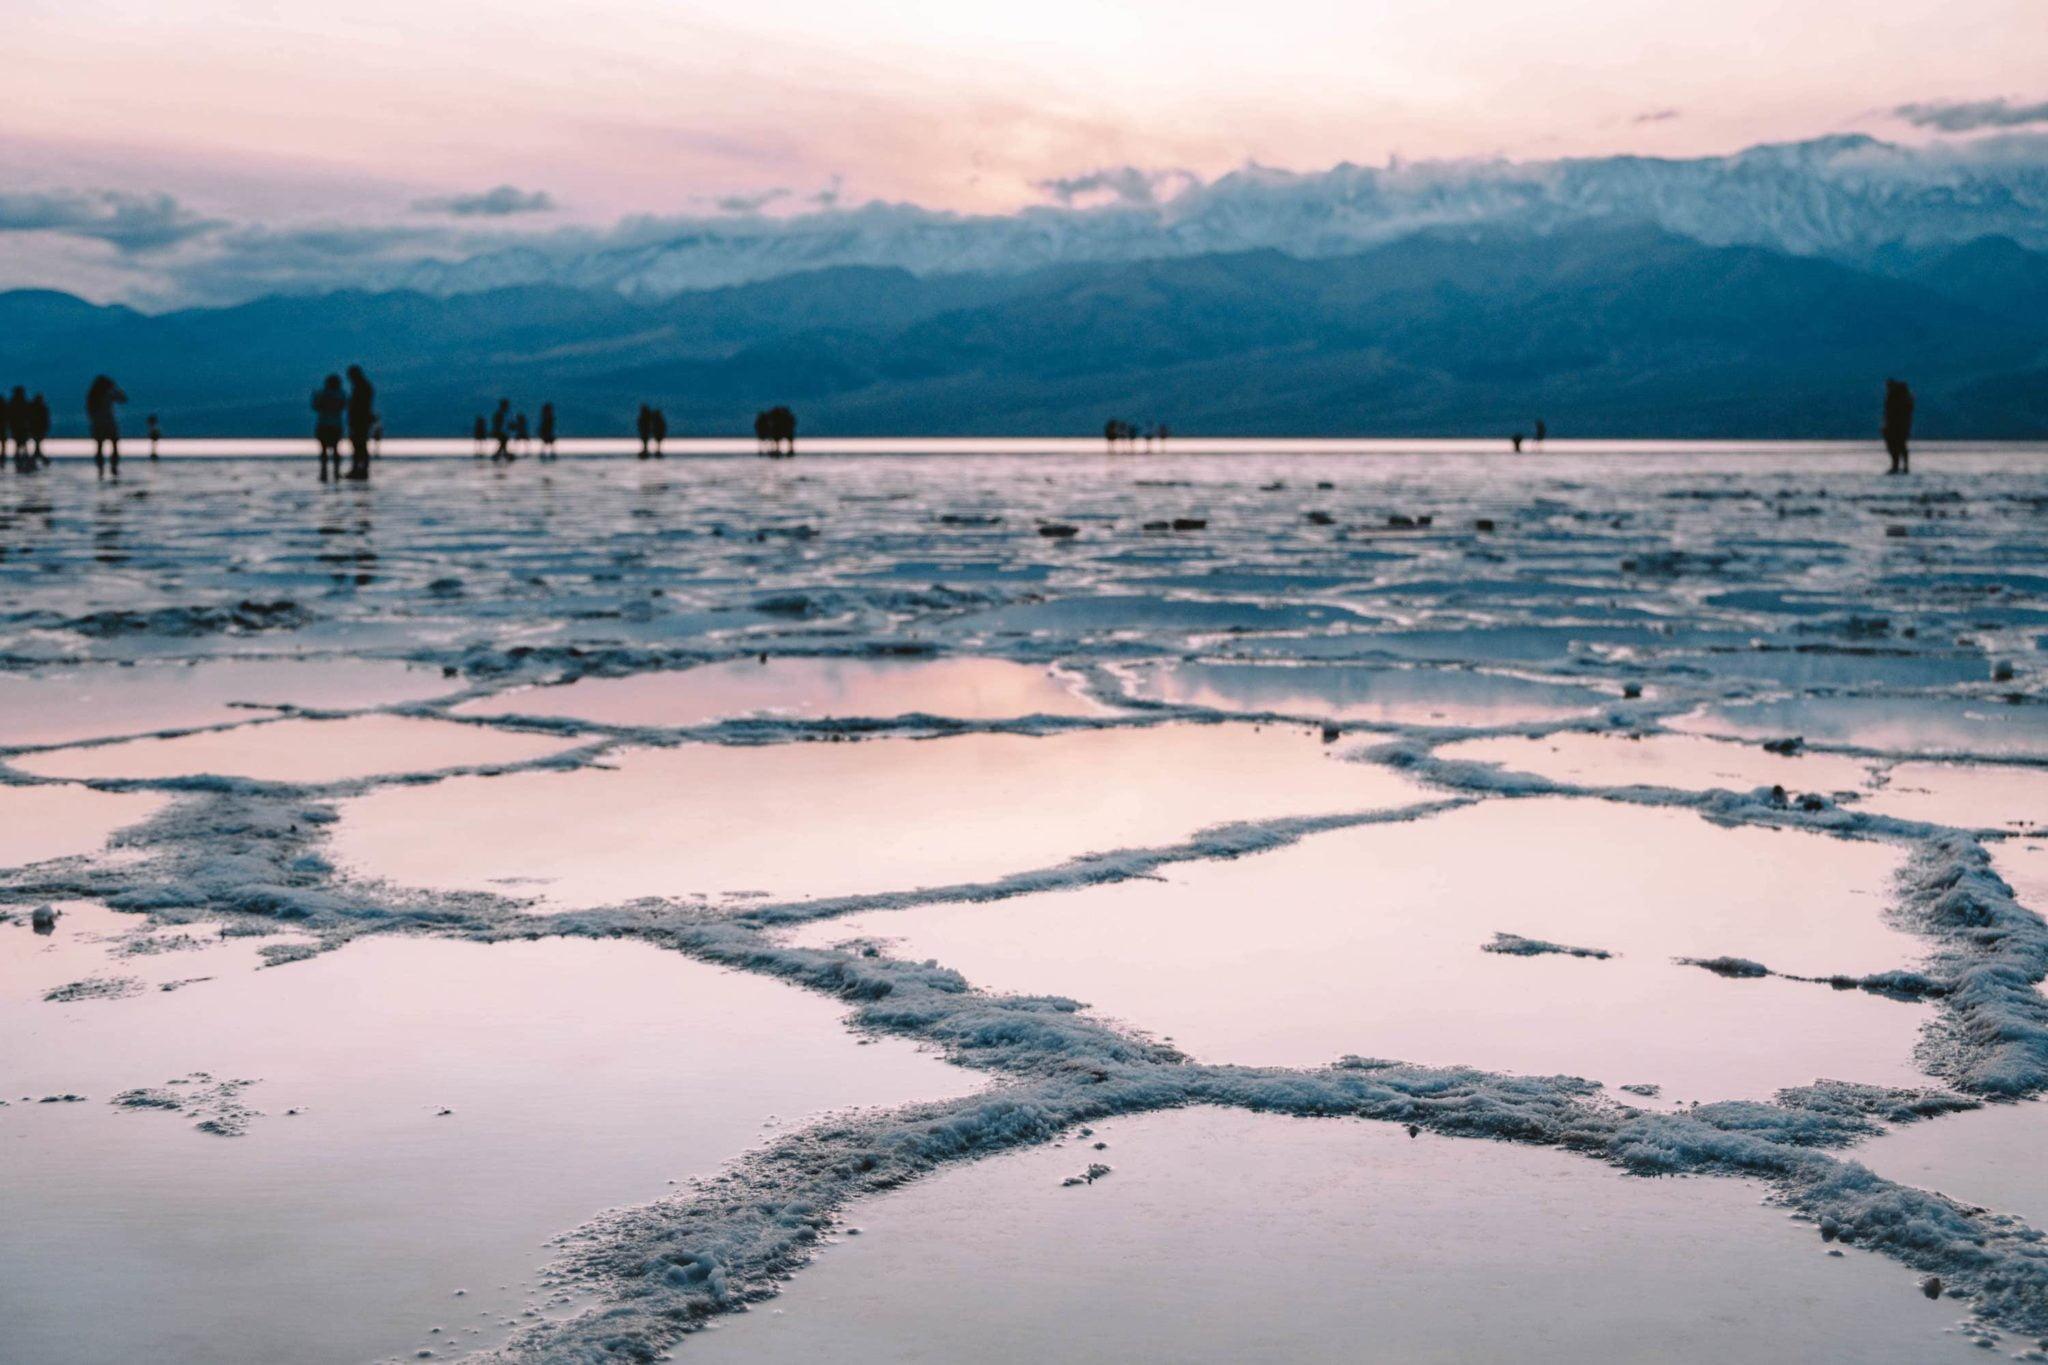 Badwater Basin - a salt flat below sea level in Death Valley